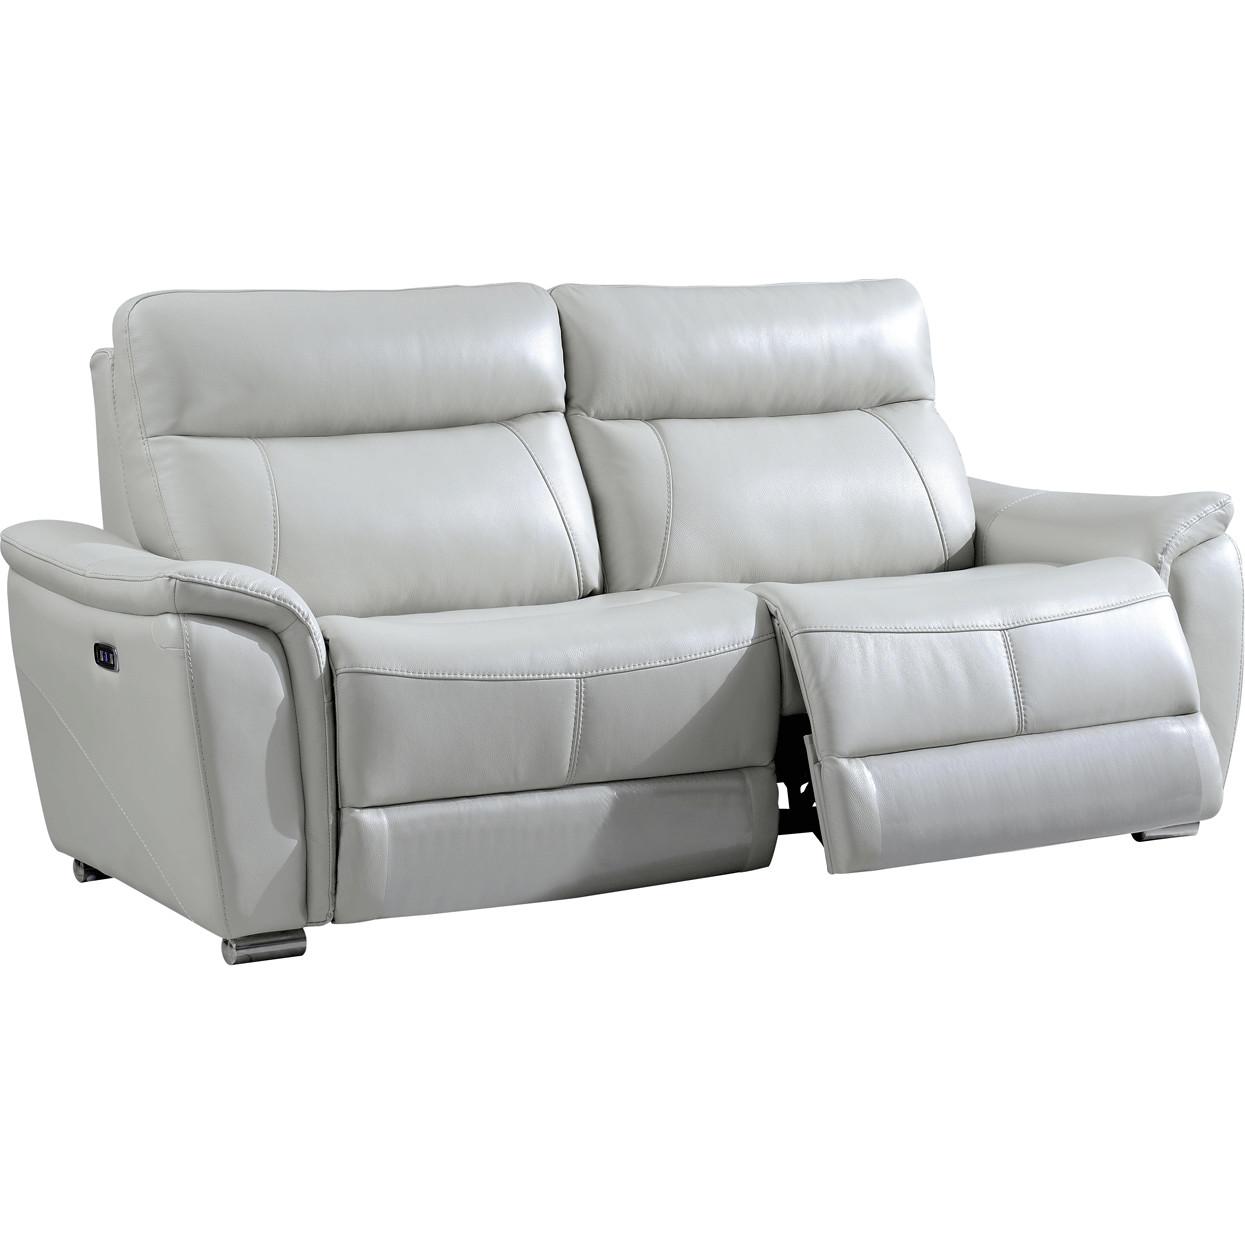 Esf Imports 17053 1705 Reclining Sofa